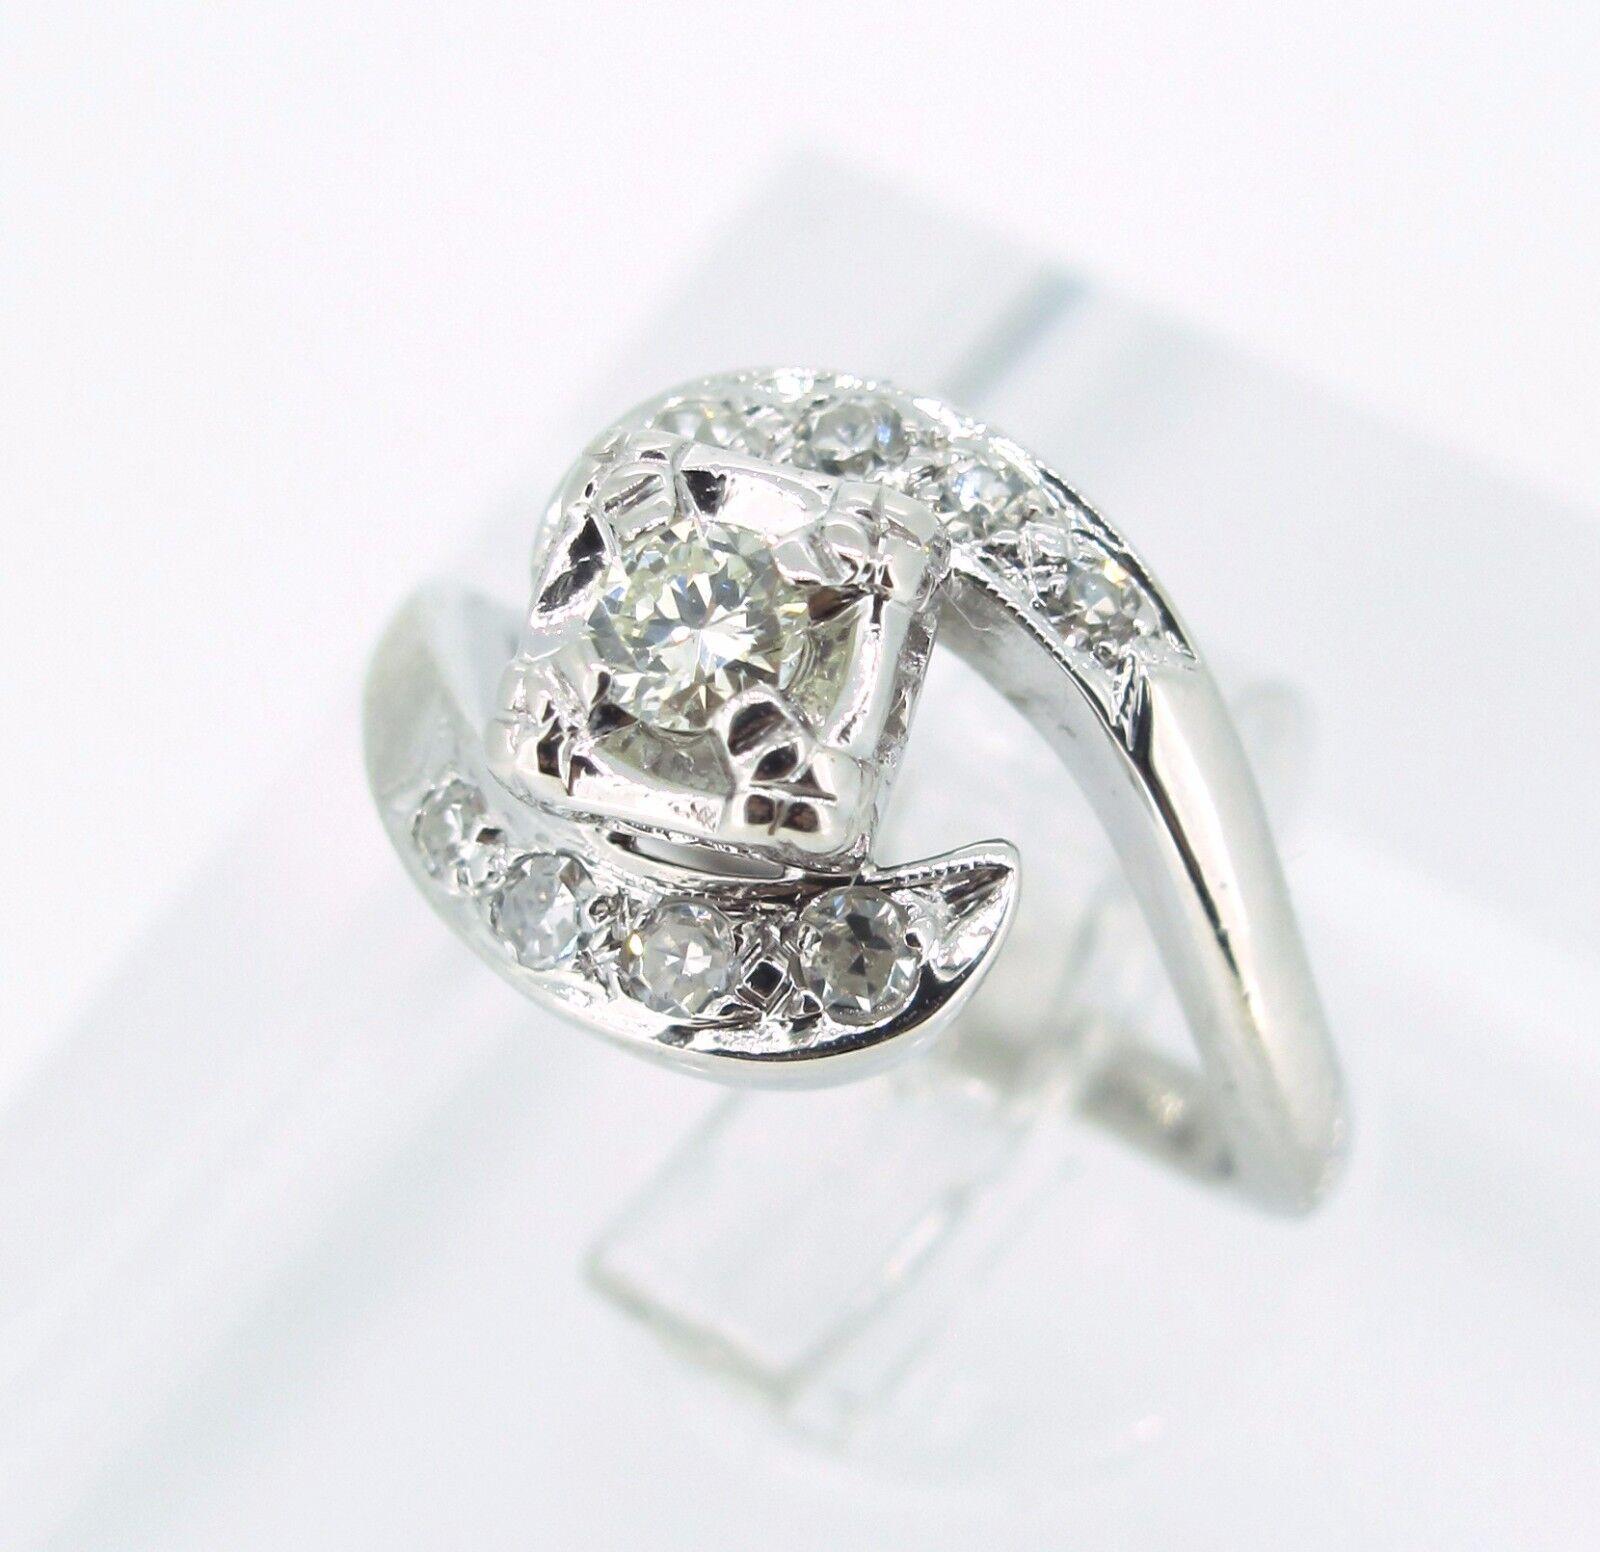 .35 ct tw DIAMONDS 14k White gold Tension Set Swirl ANTIQUE Ladies Ring Size 4.5